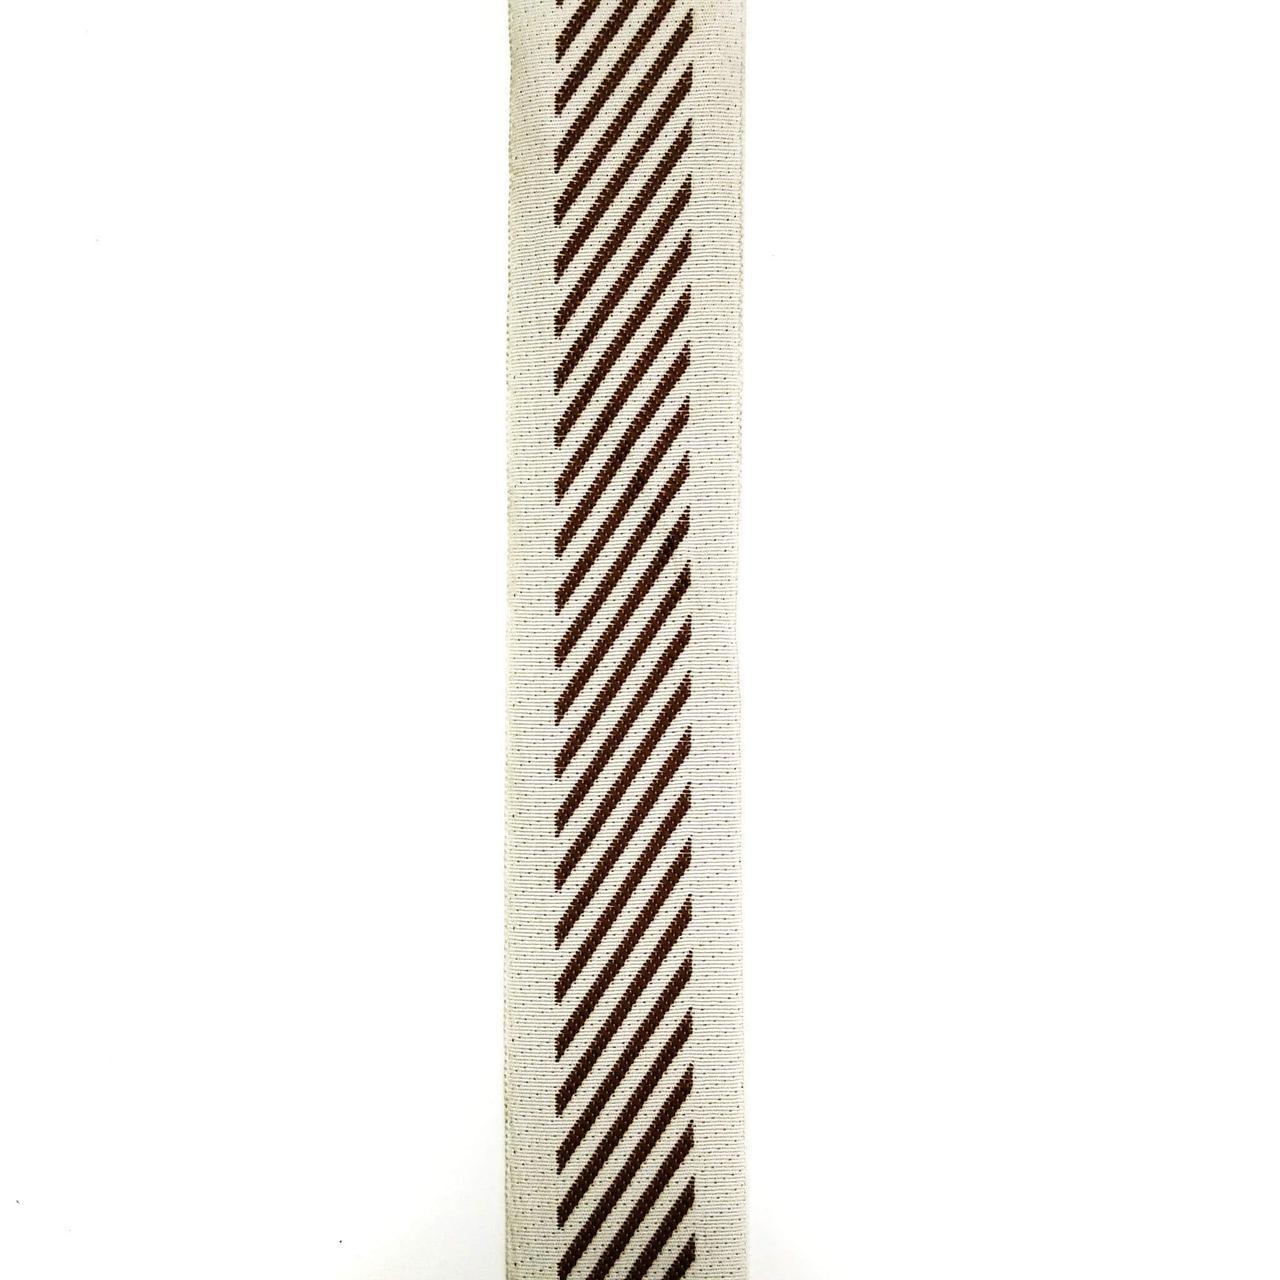 Стрічка обробна одеяльная 30 мм (50м/рулон)